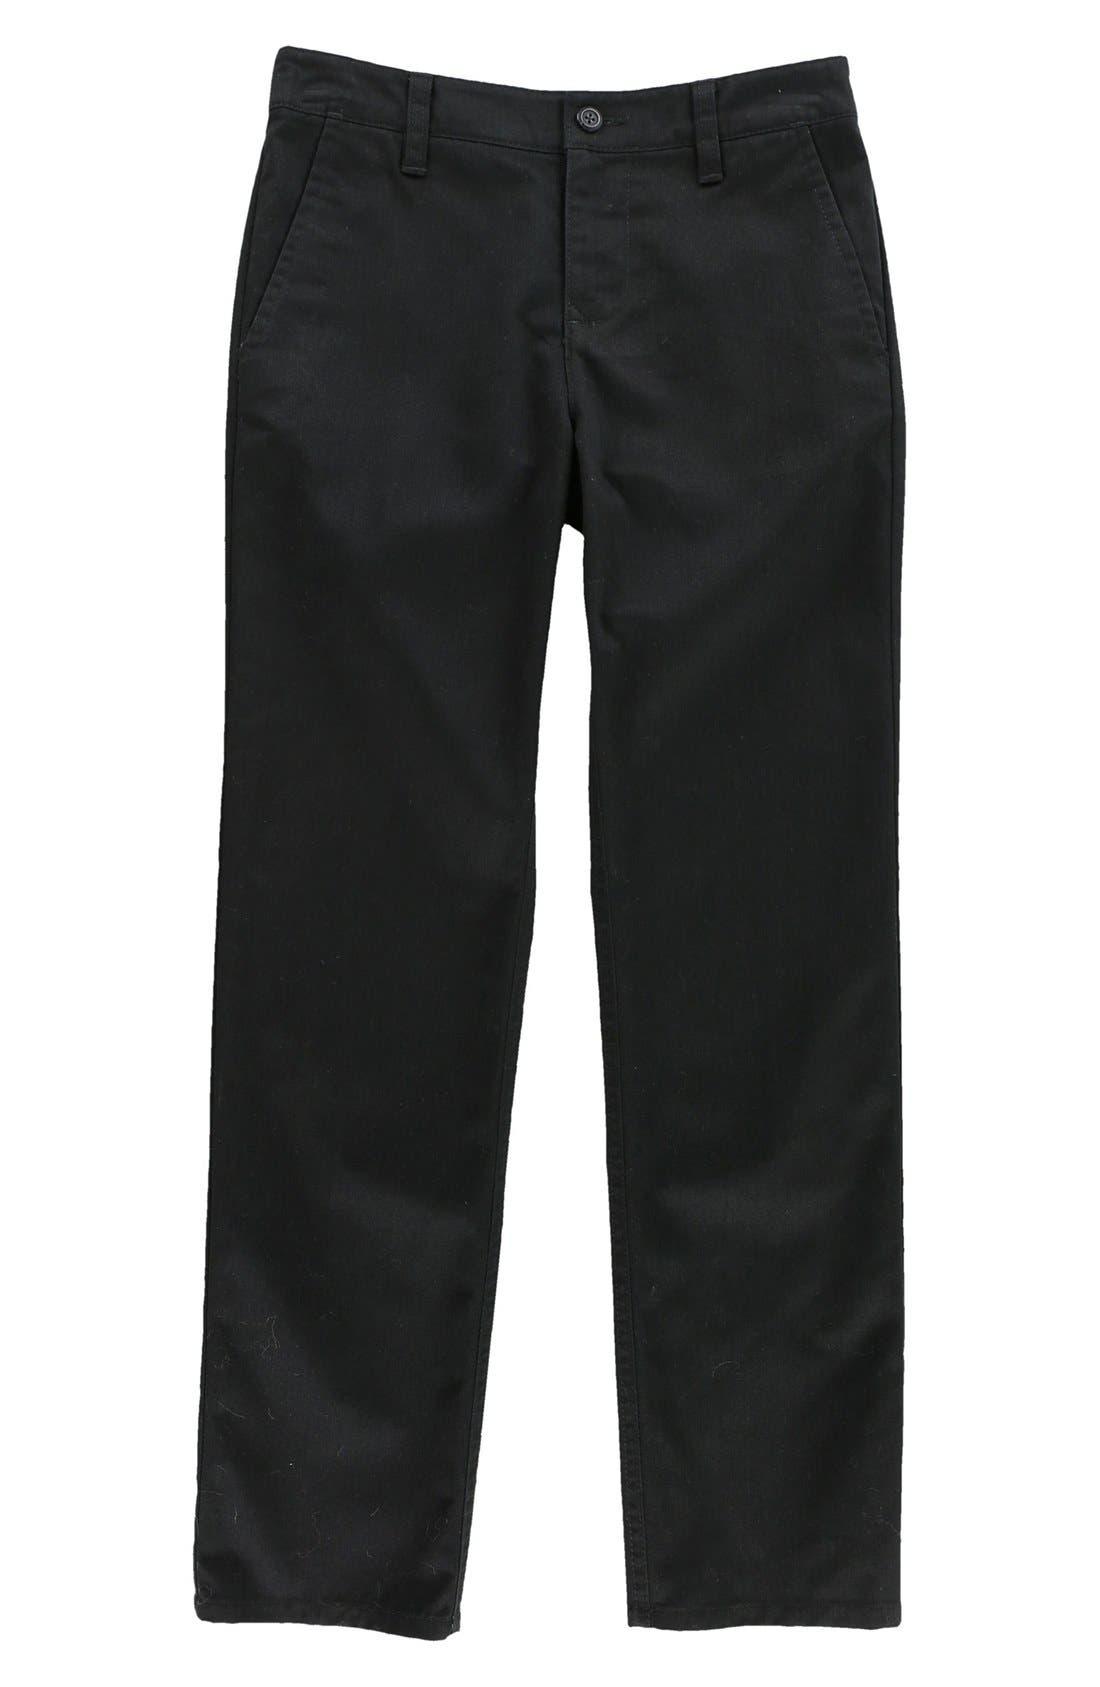 Contact Straight Leg Twill Pants,                         Main,                         color, Black